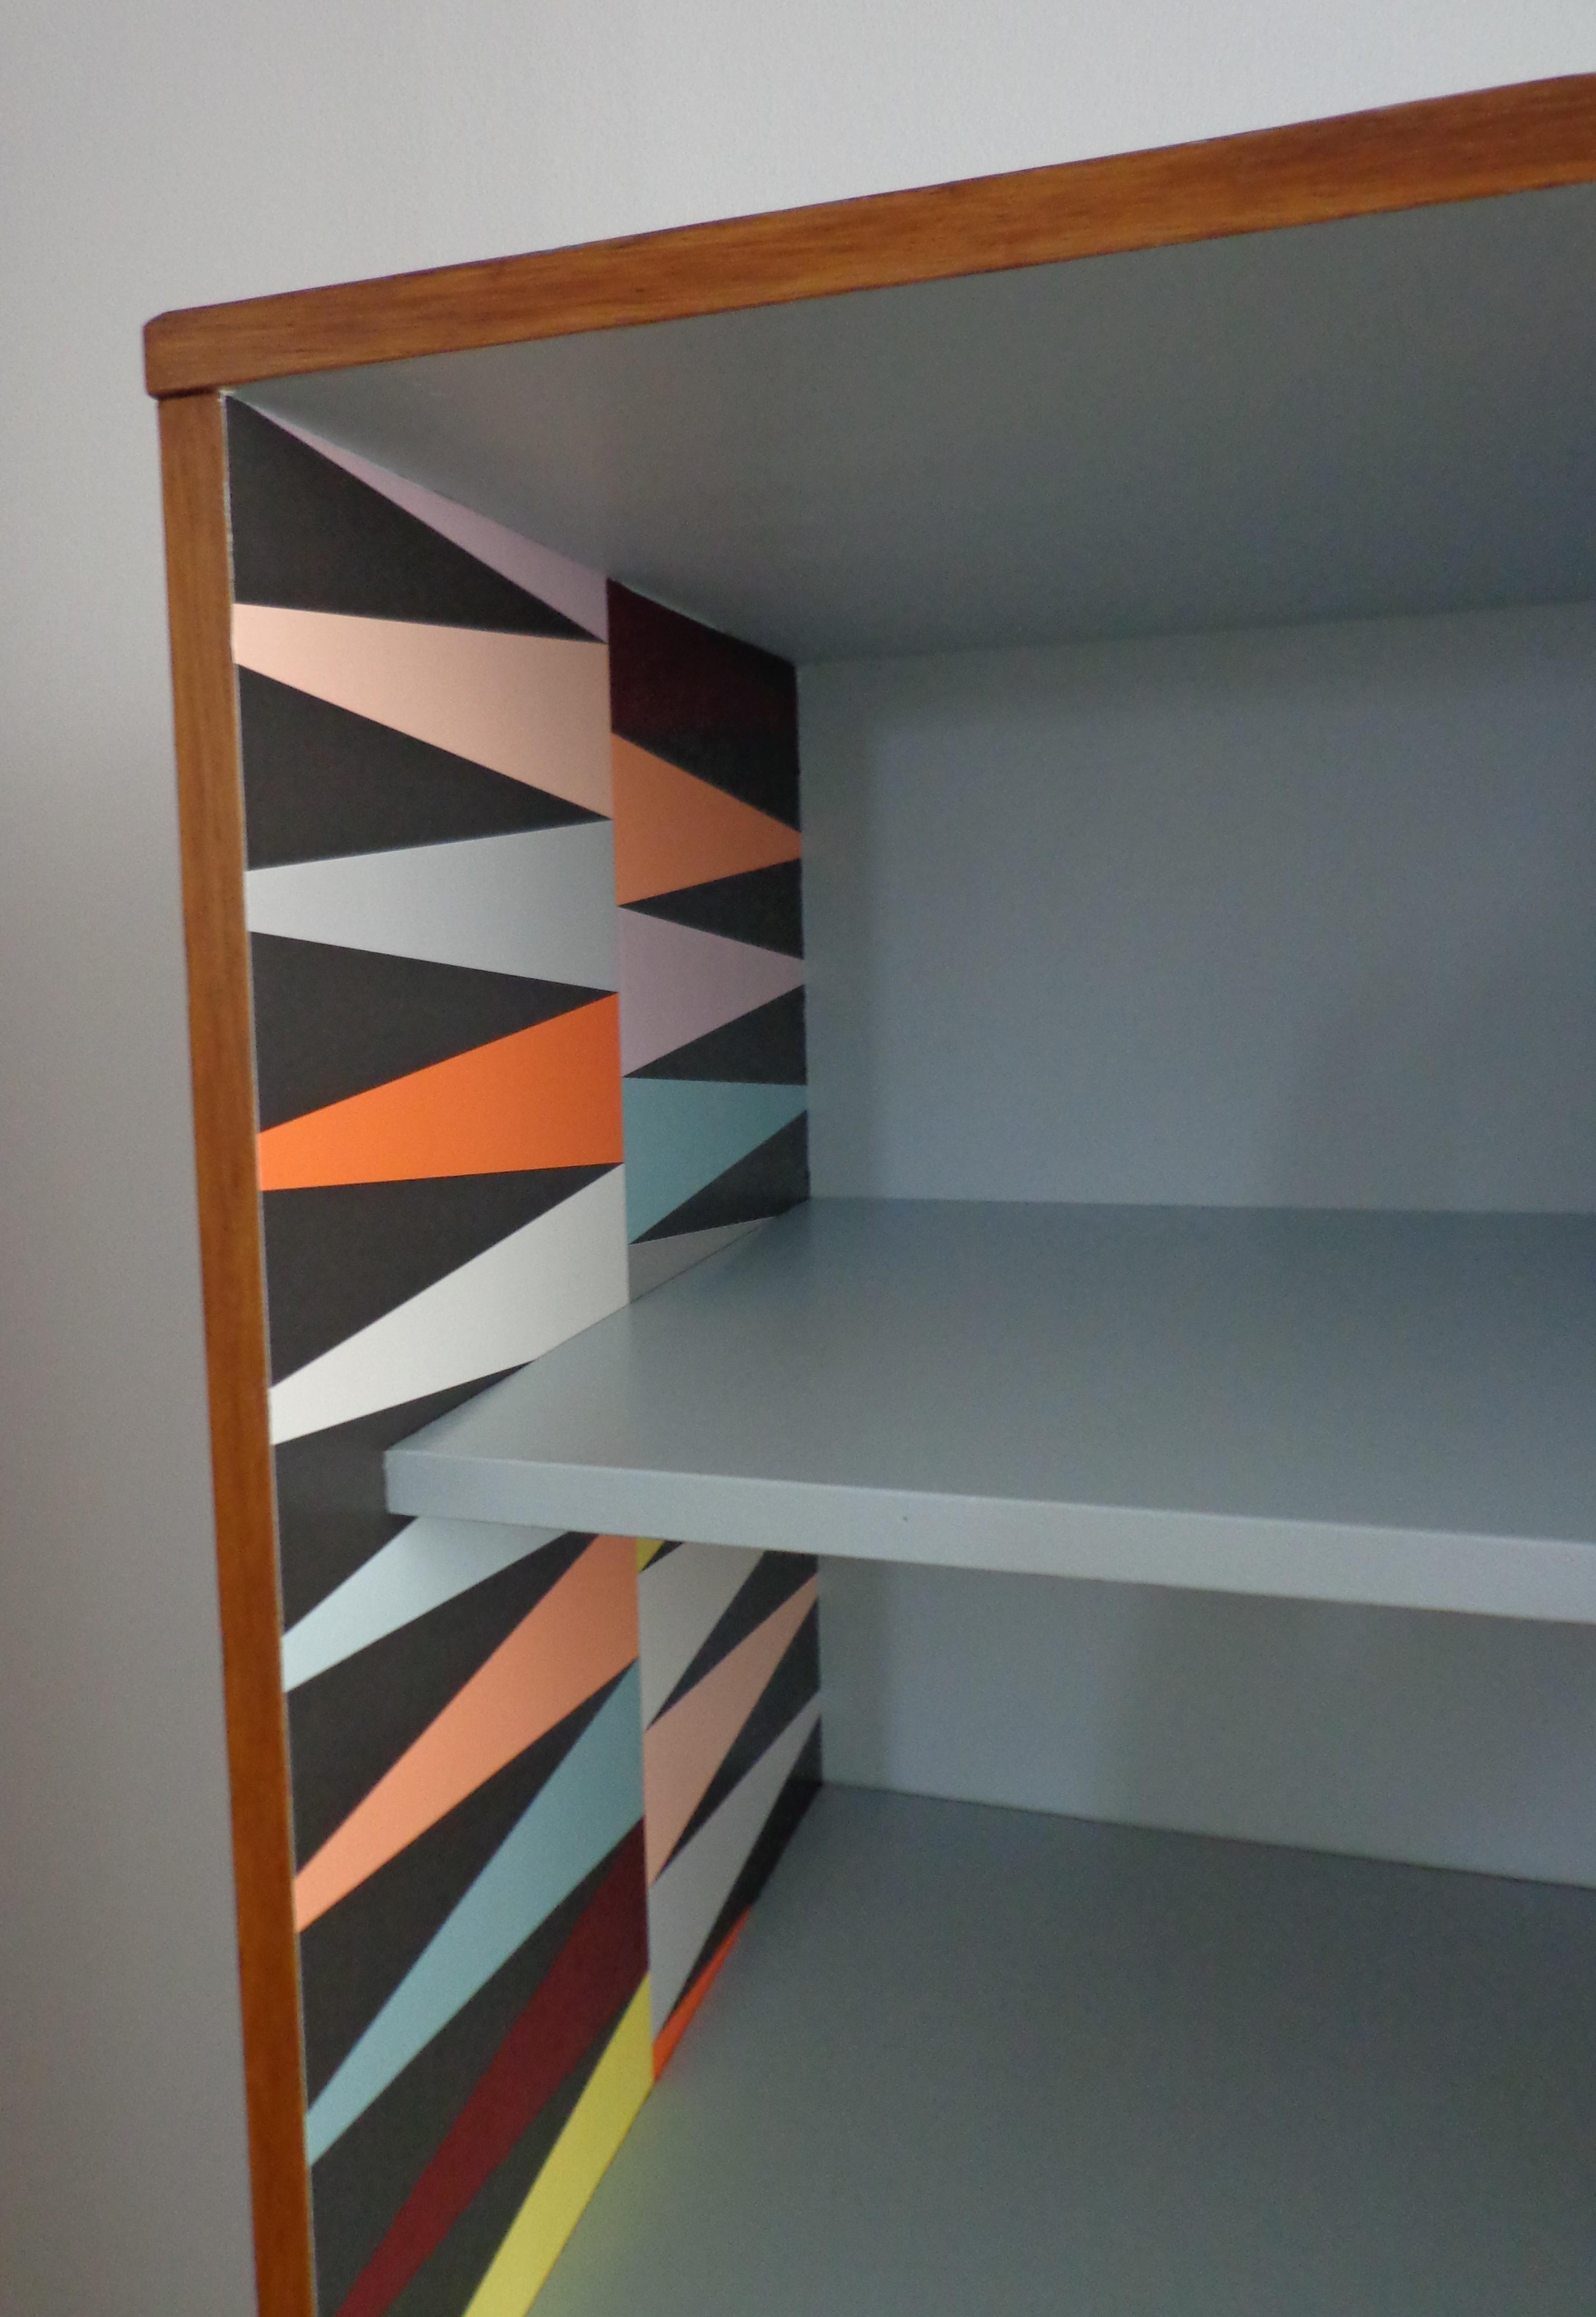 armoire scandinave bleue. Black Bedroom Furniture Sets. Home Design Ideas